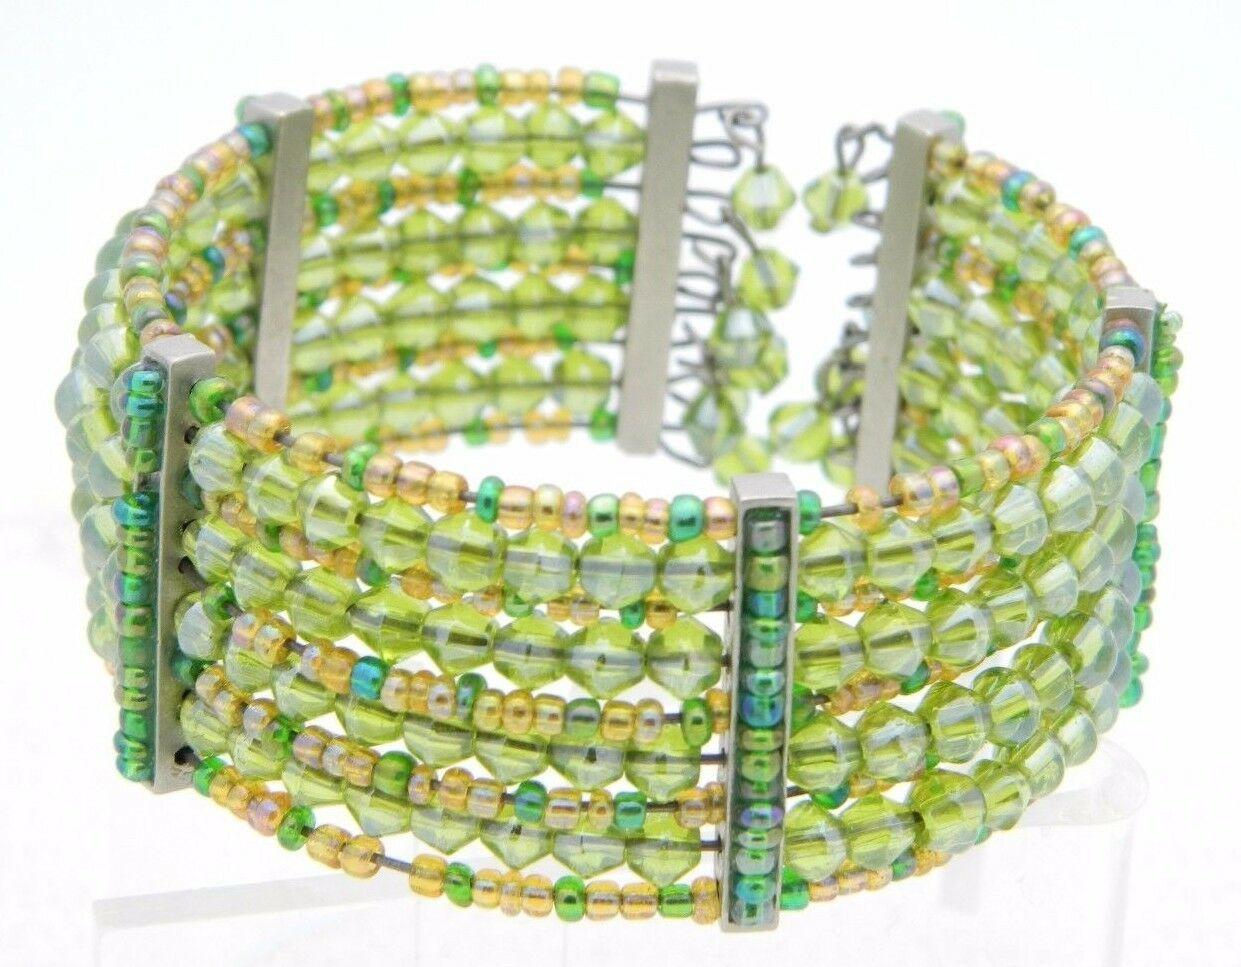 VTG Multi-Colored Green Glass Bead Beaded Cuff Bracelet